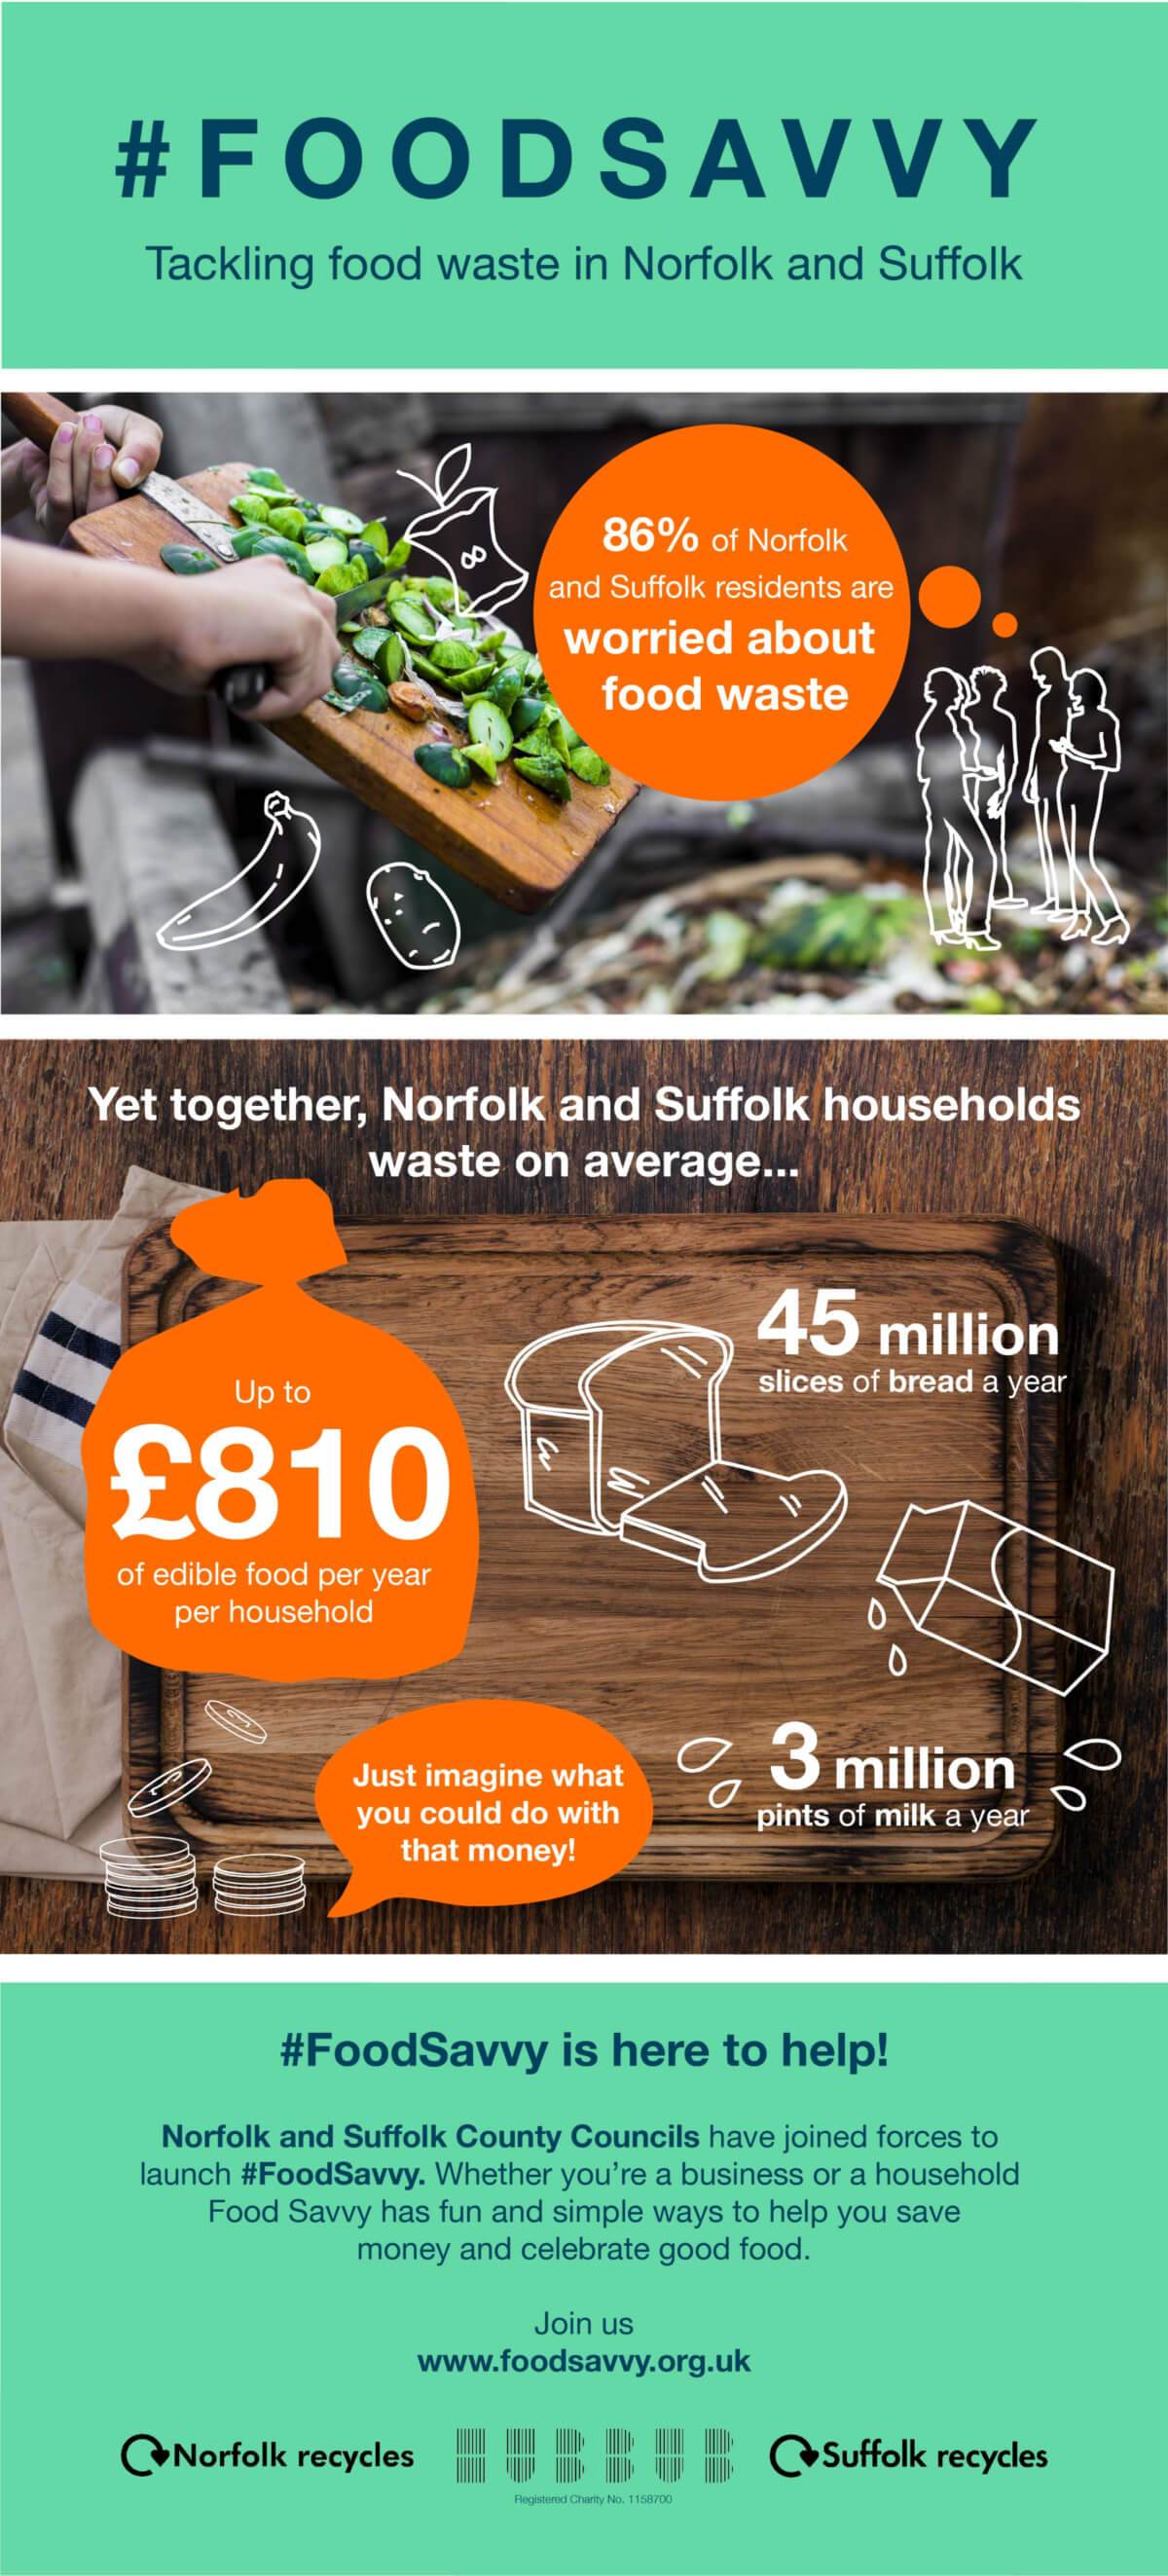 #FoodSavvy Infographic